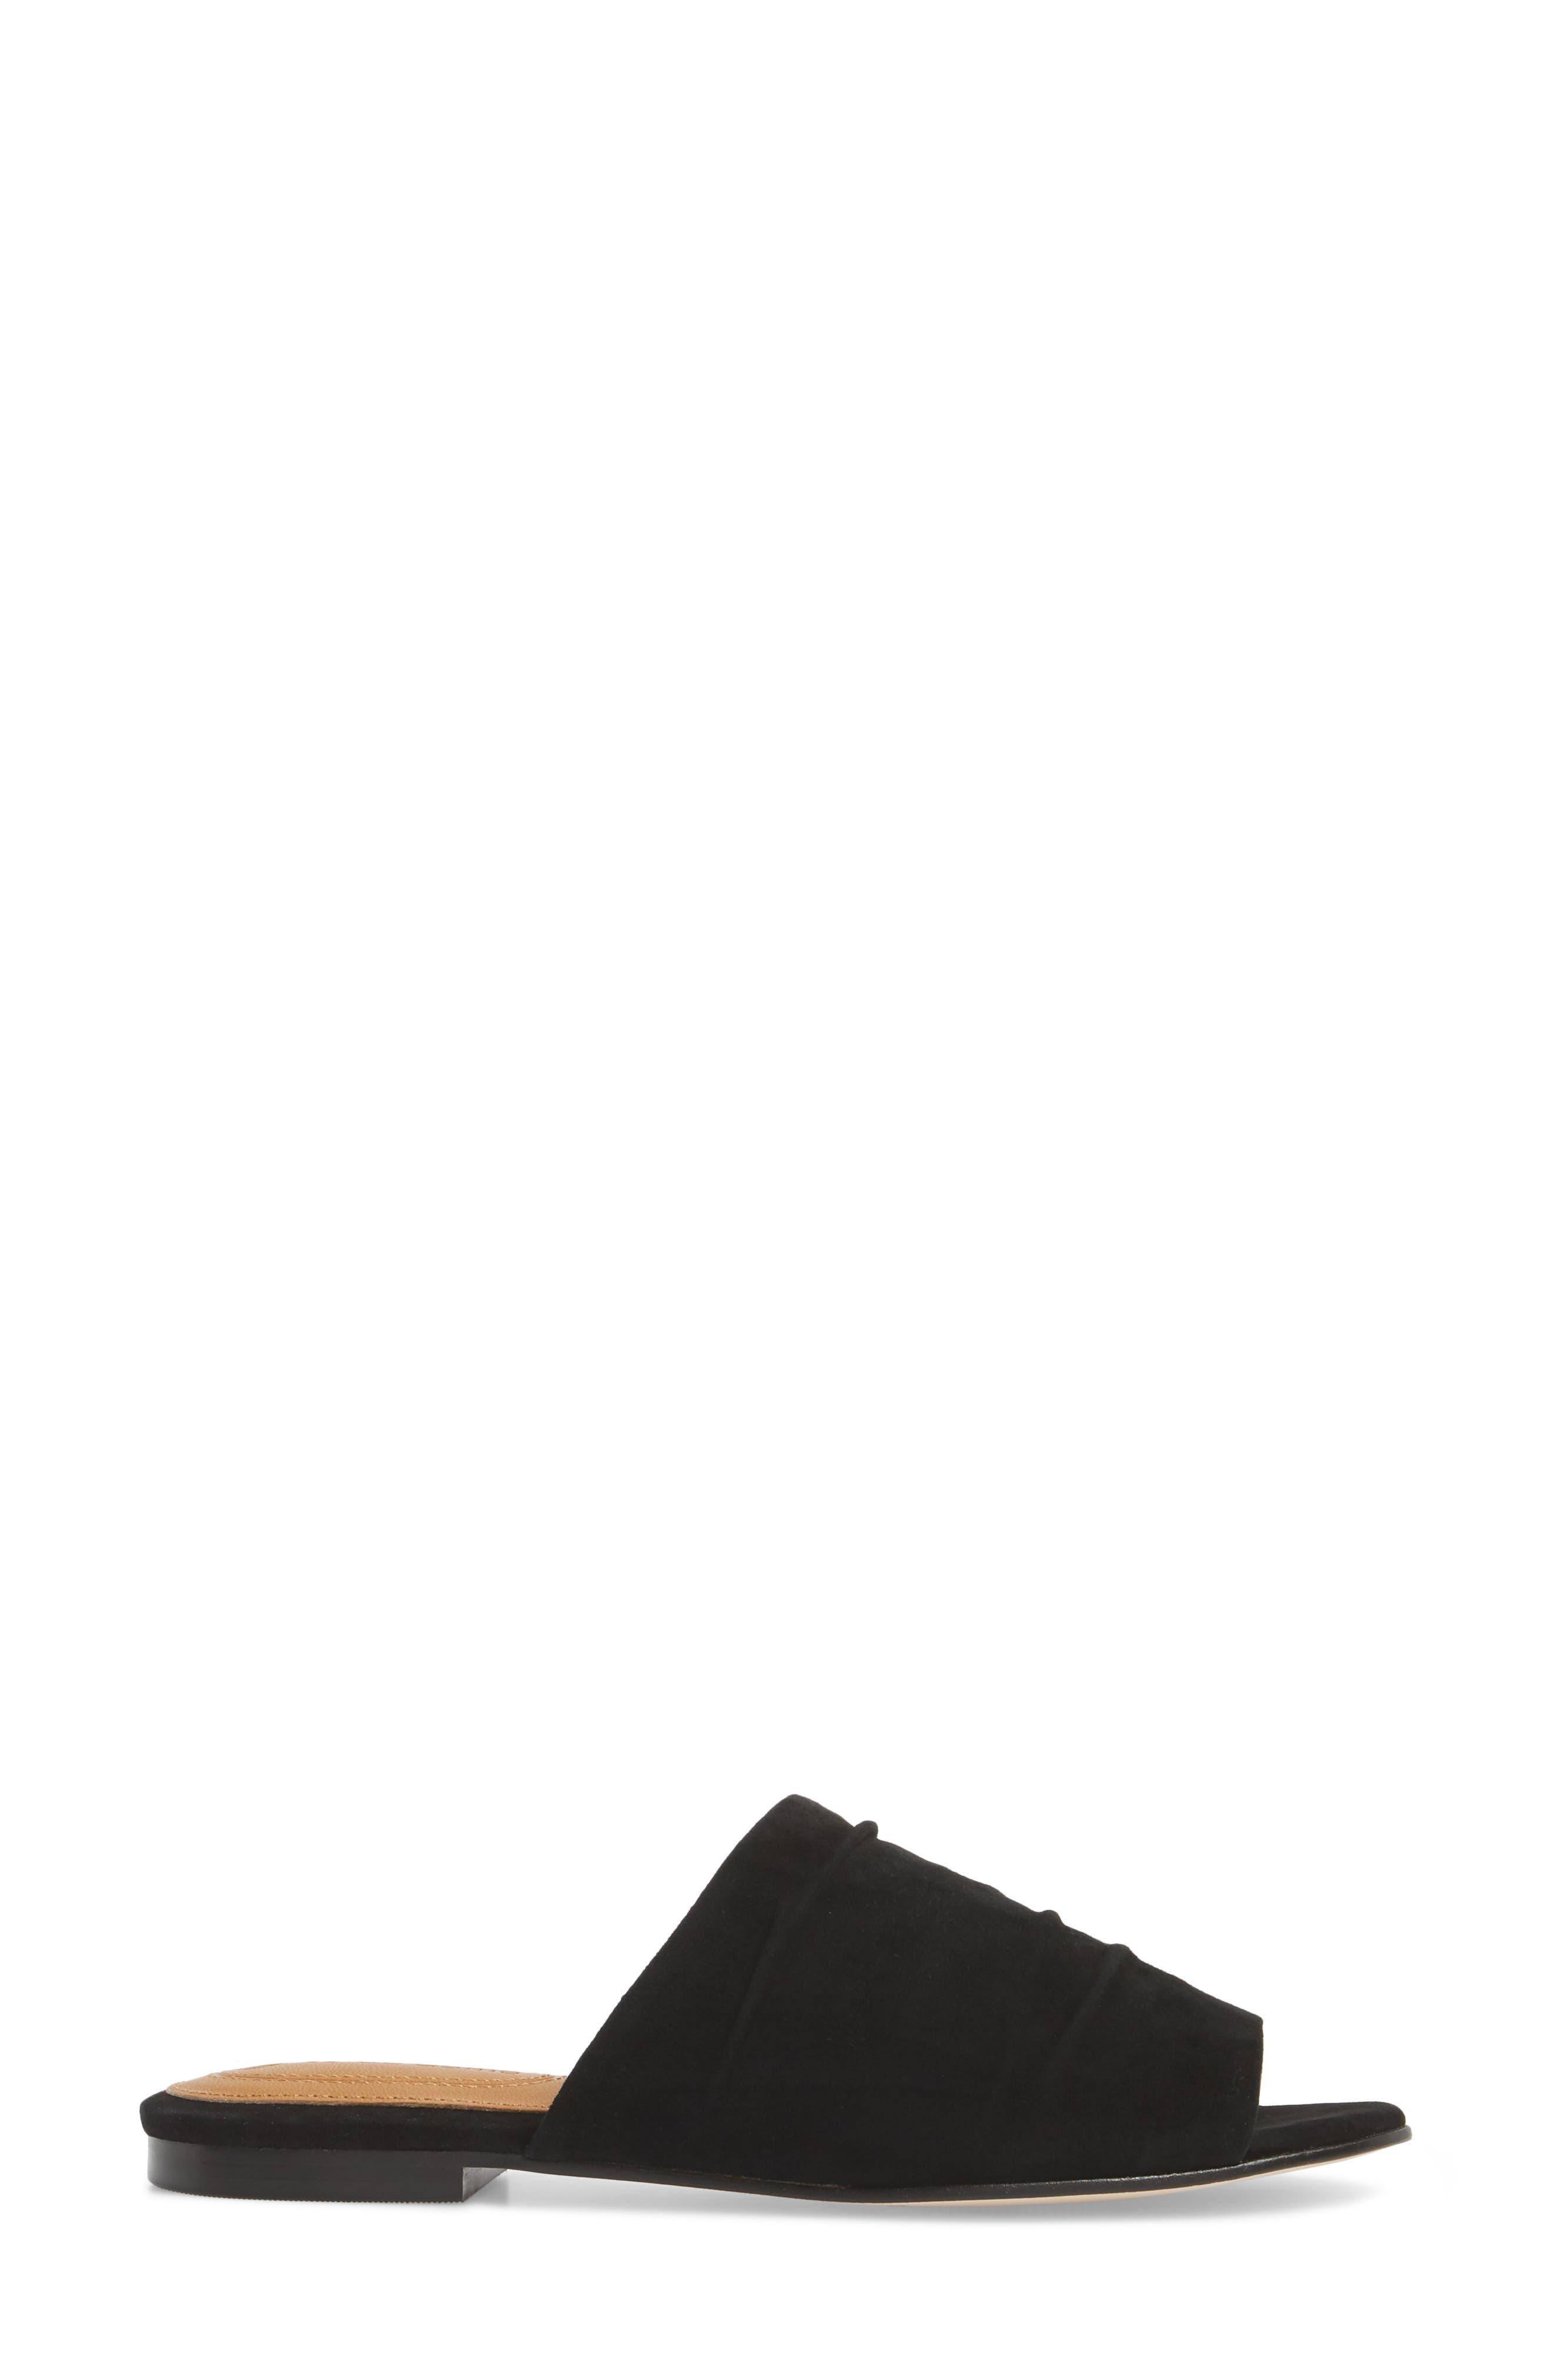 Beachaven Slide Sandal,                             Alternate thumbnail 3, color,                             Black Suede